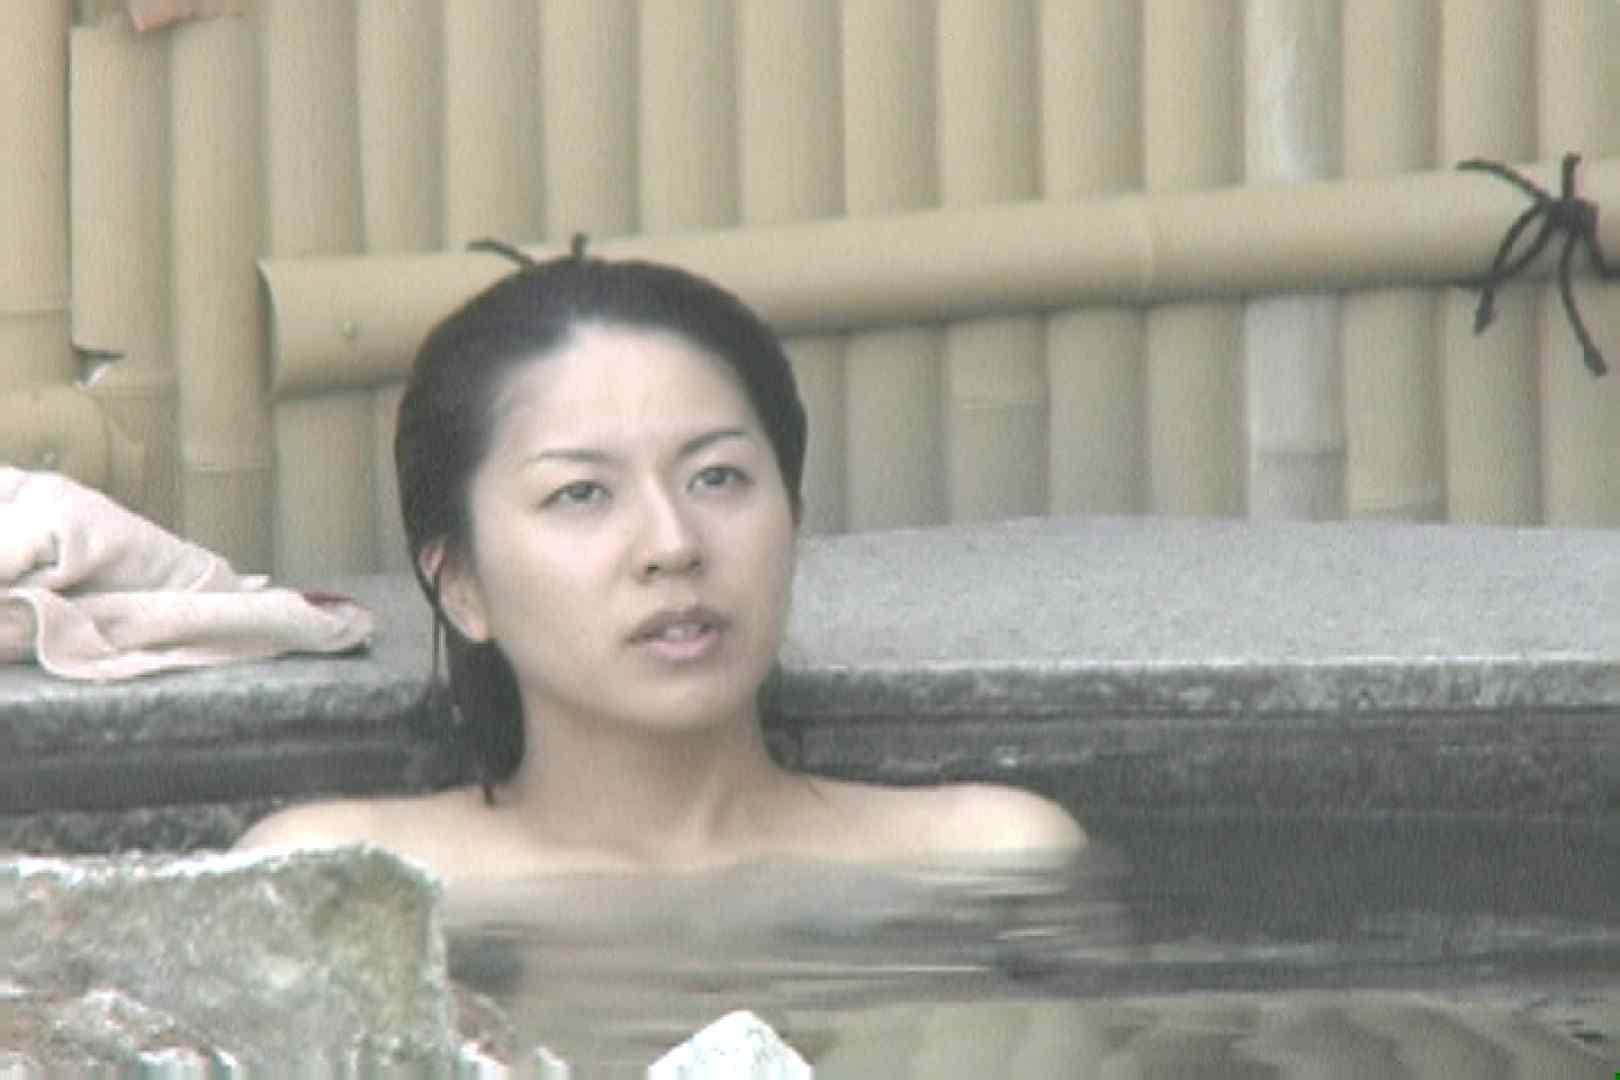 Aquaな露天風呂Vol.694 露天 オメコ無修正動画無料 110PICs 35